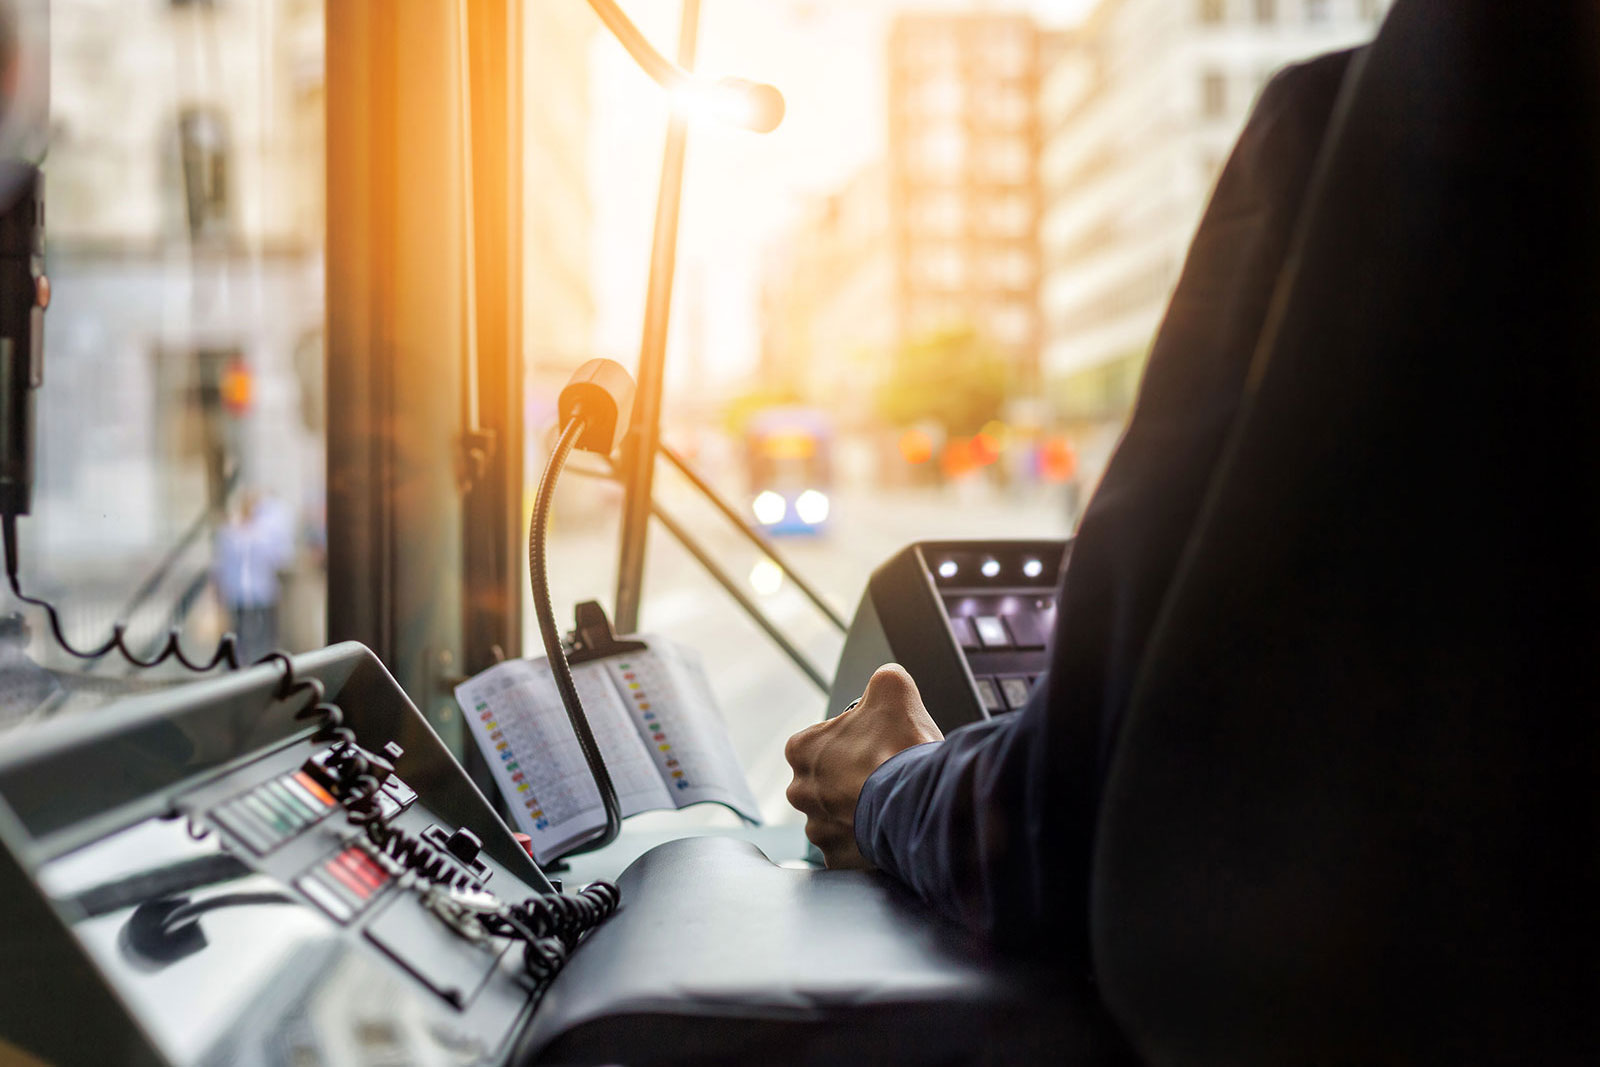 Personen-Notsignal-Anlagen •Personennotsignalsystem •oscom-Deutschland •Zugfahrer •Alleinarbeiterschutz •Alleinarbeit • Alleinarbeitsplatz • Mitarbeitersicherung